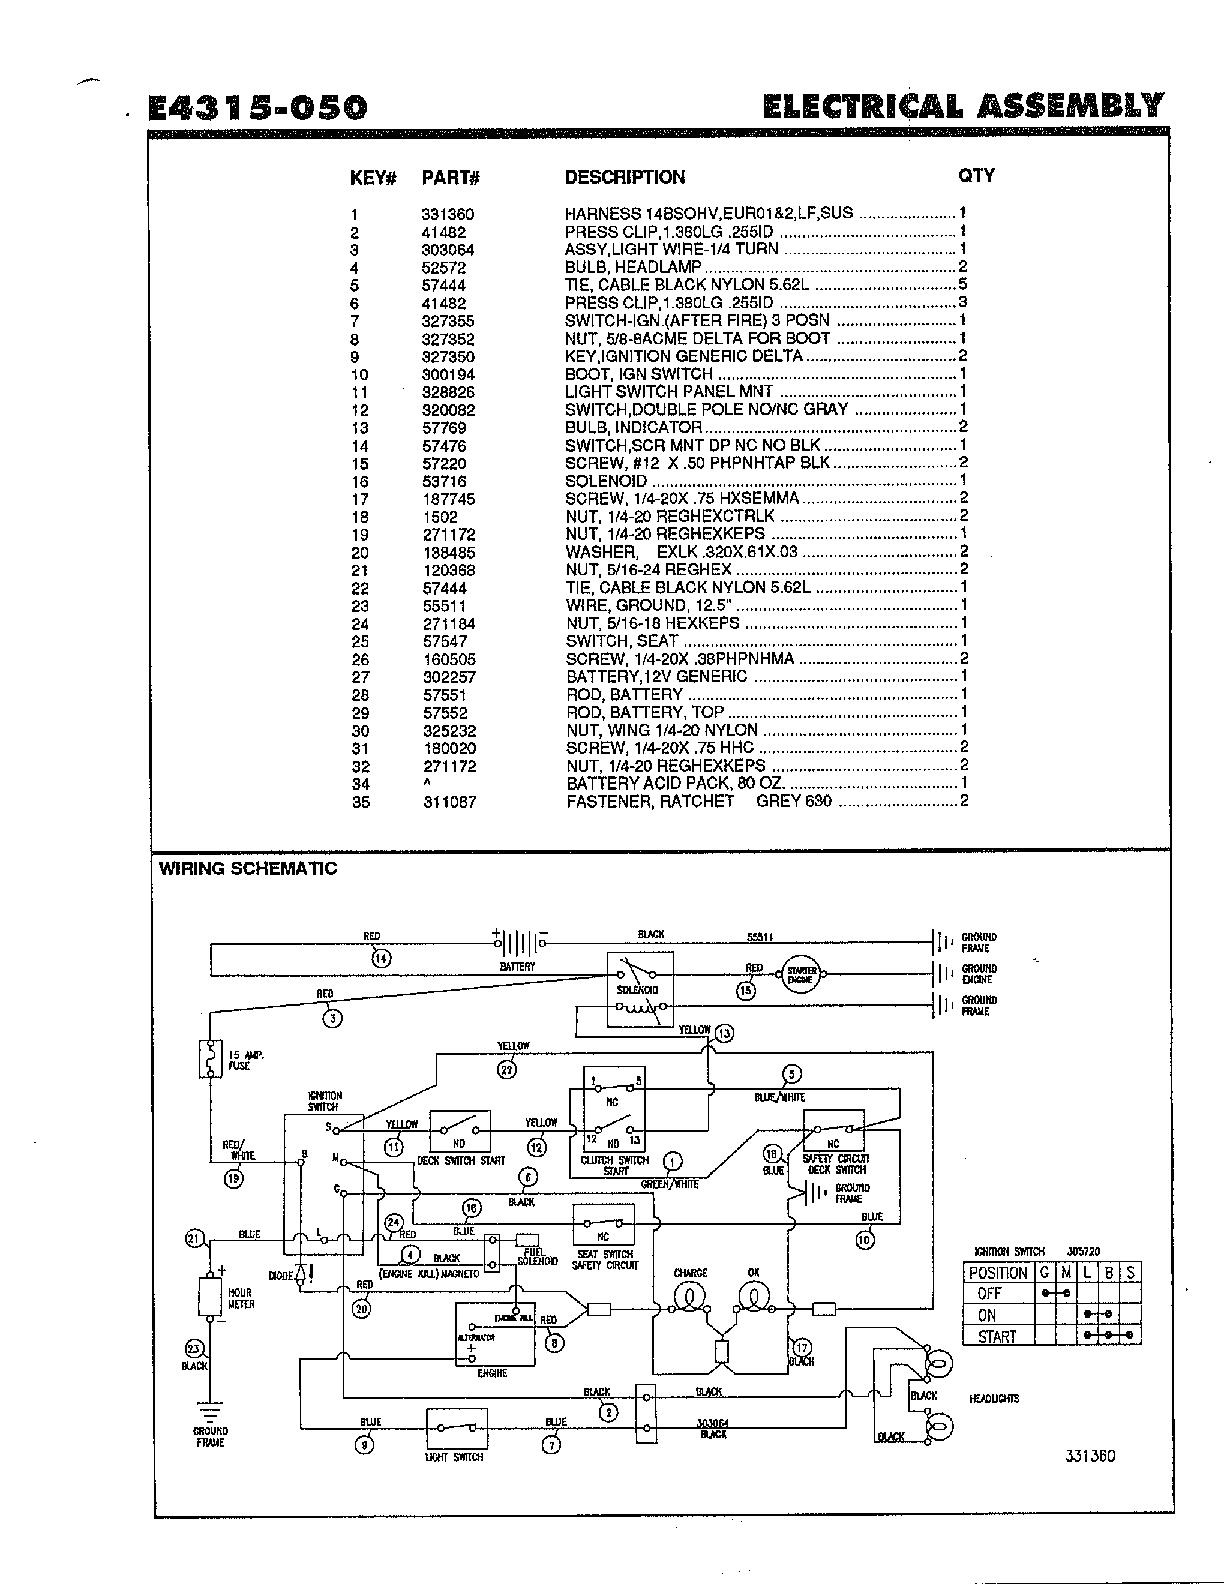 john deere 4x2 gator wiring diagram 2006 vw jetta 625i 36